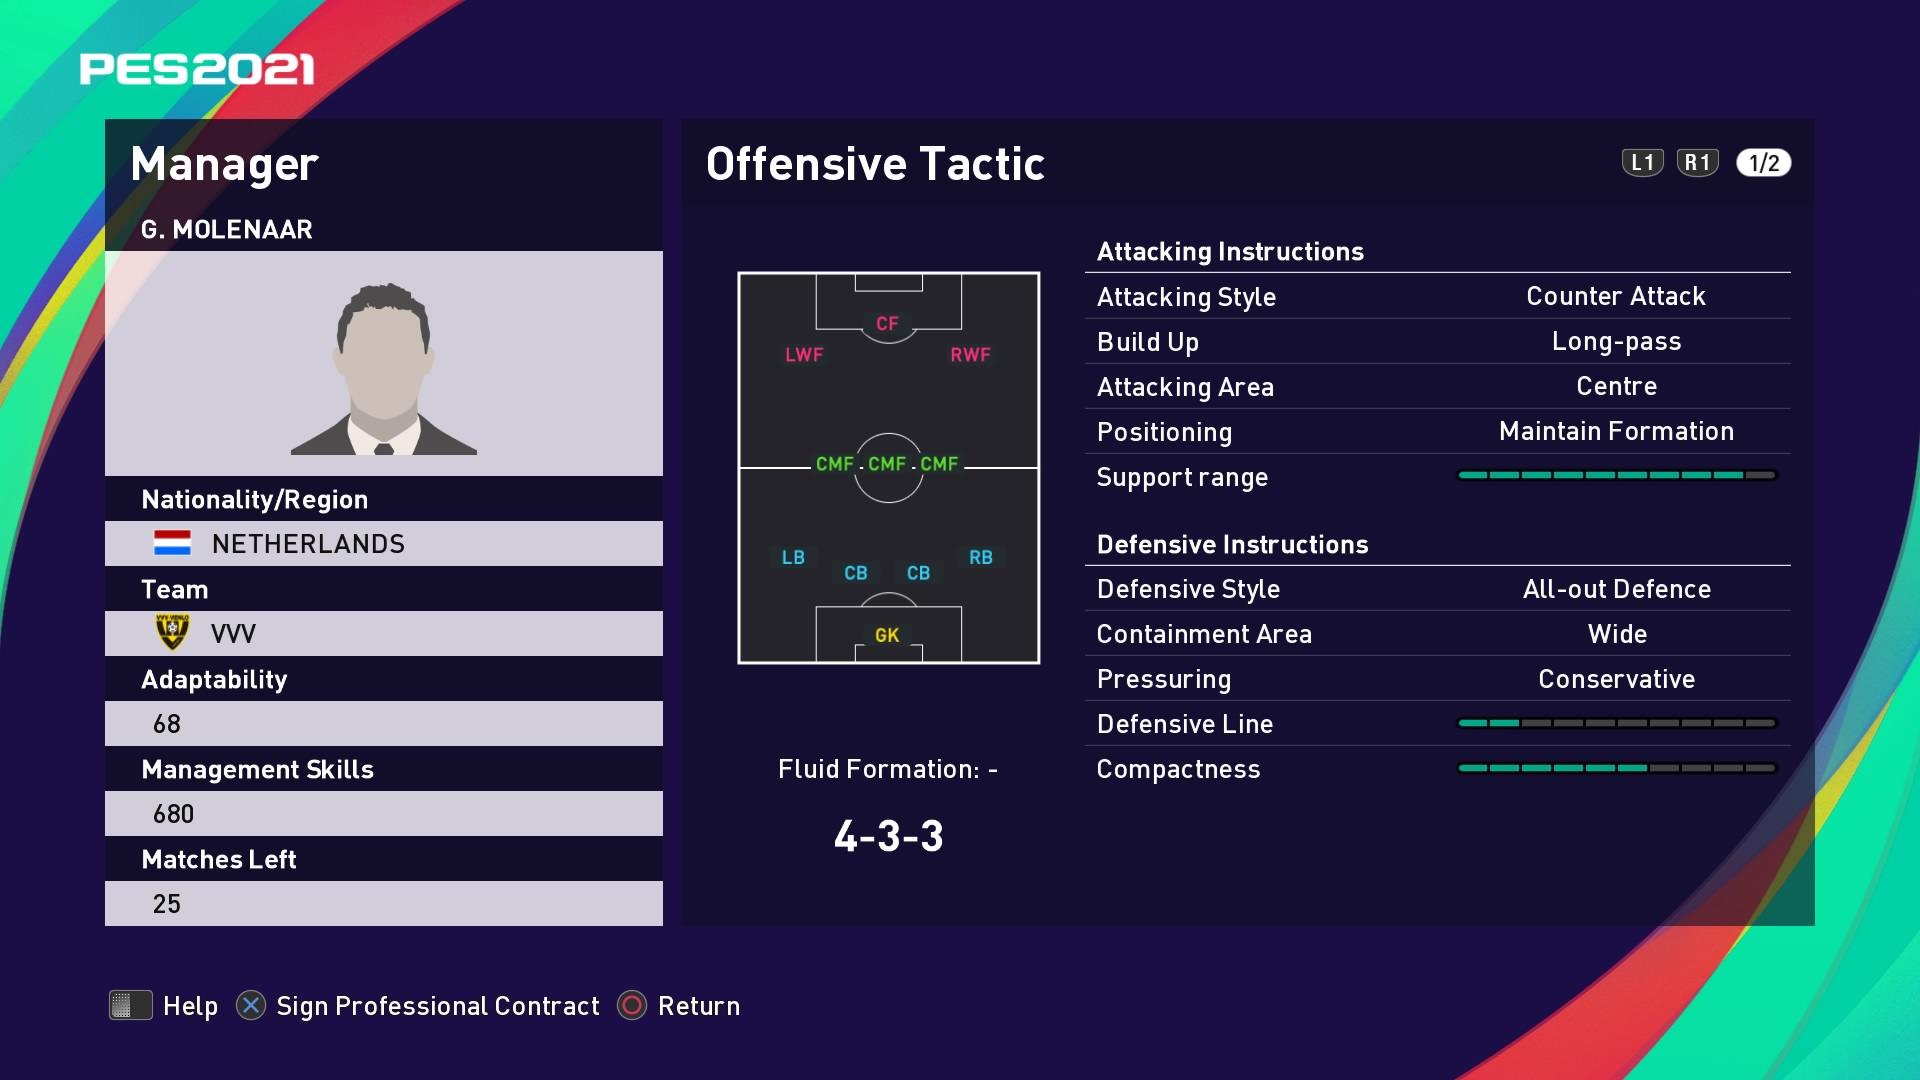 G. Molenaar (Hans de Koning) Offensive Tactic in PES 2021 myClub